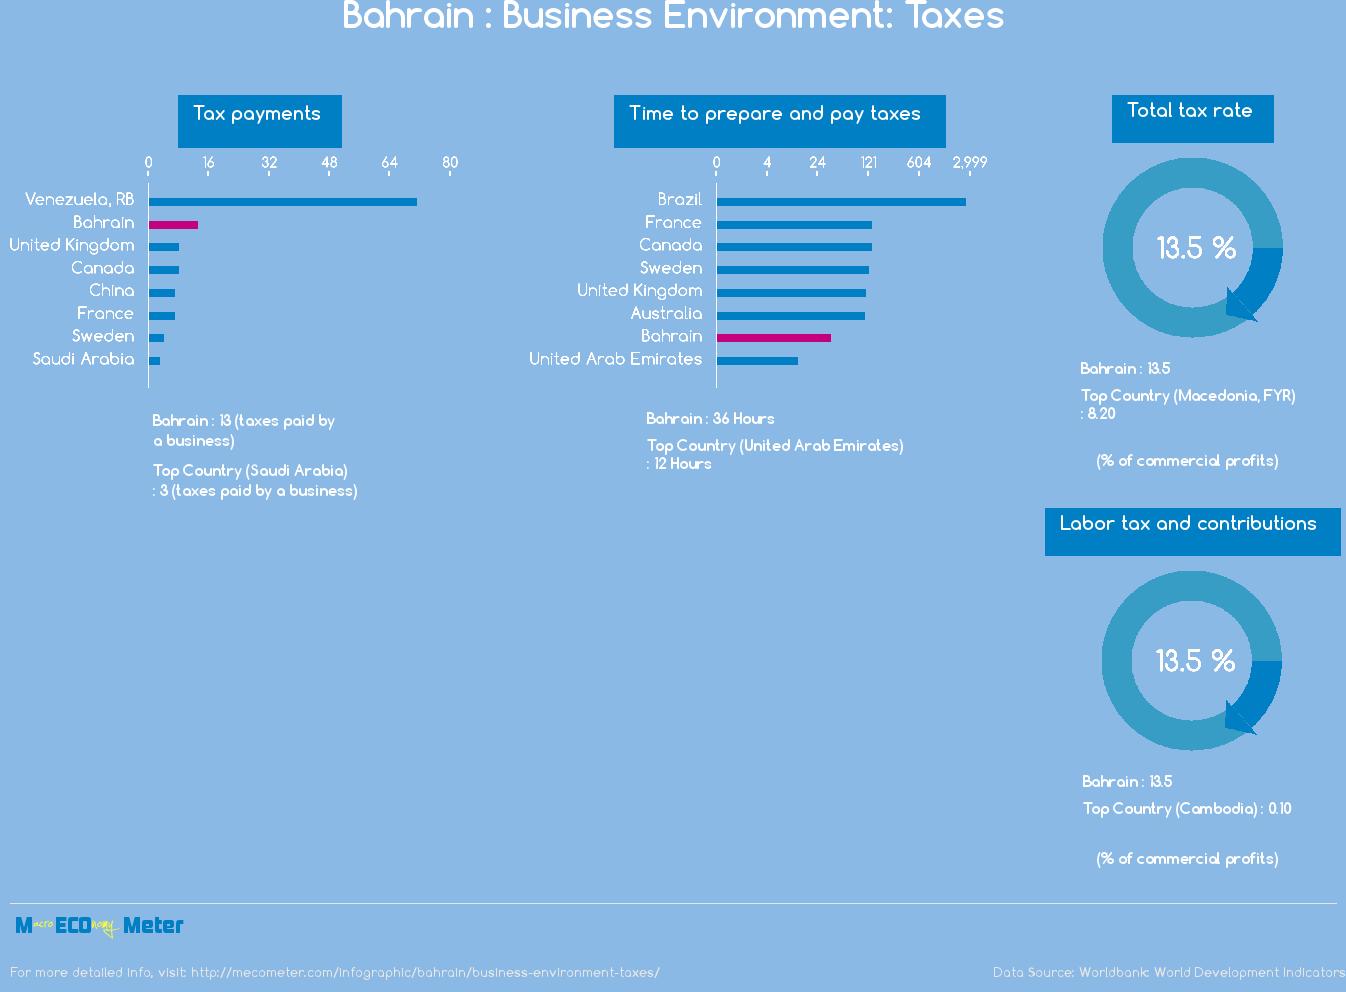 Bahrain : Business Environment: Taxes